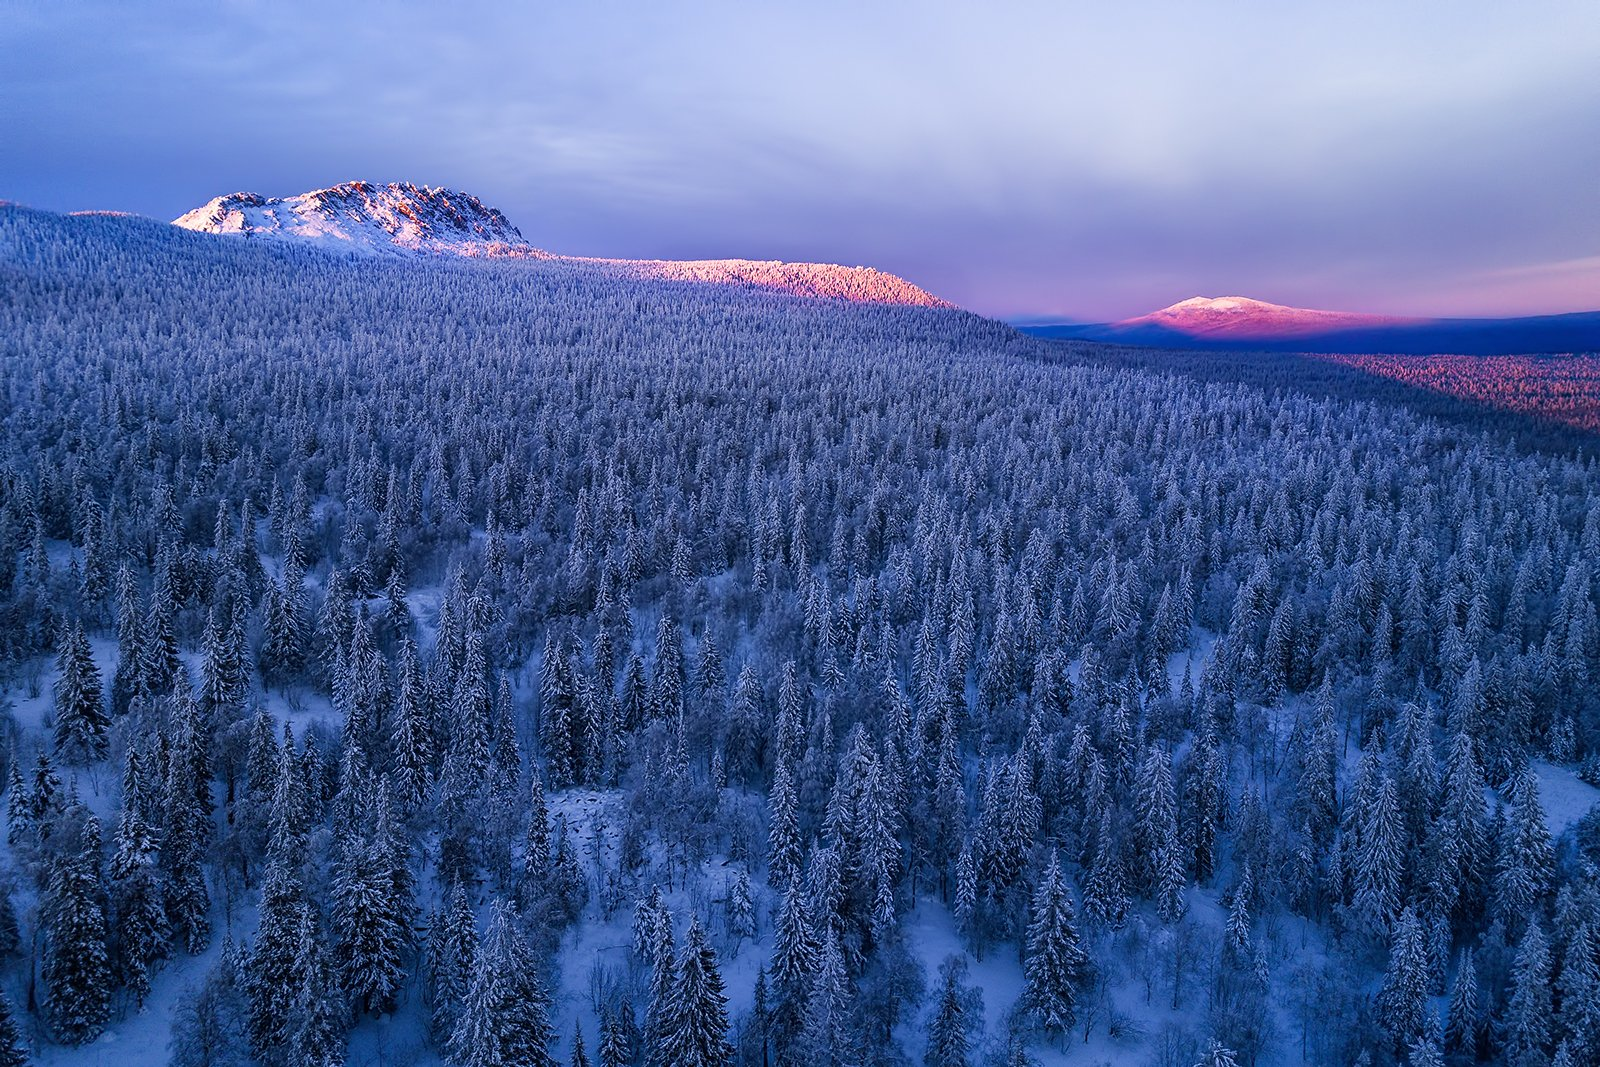 таганай, зима, урал, горы, лес, Василий Яковлев